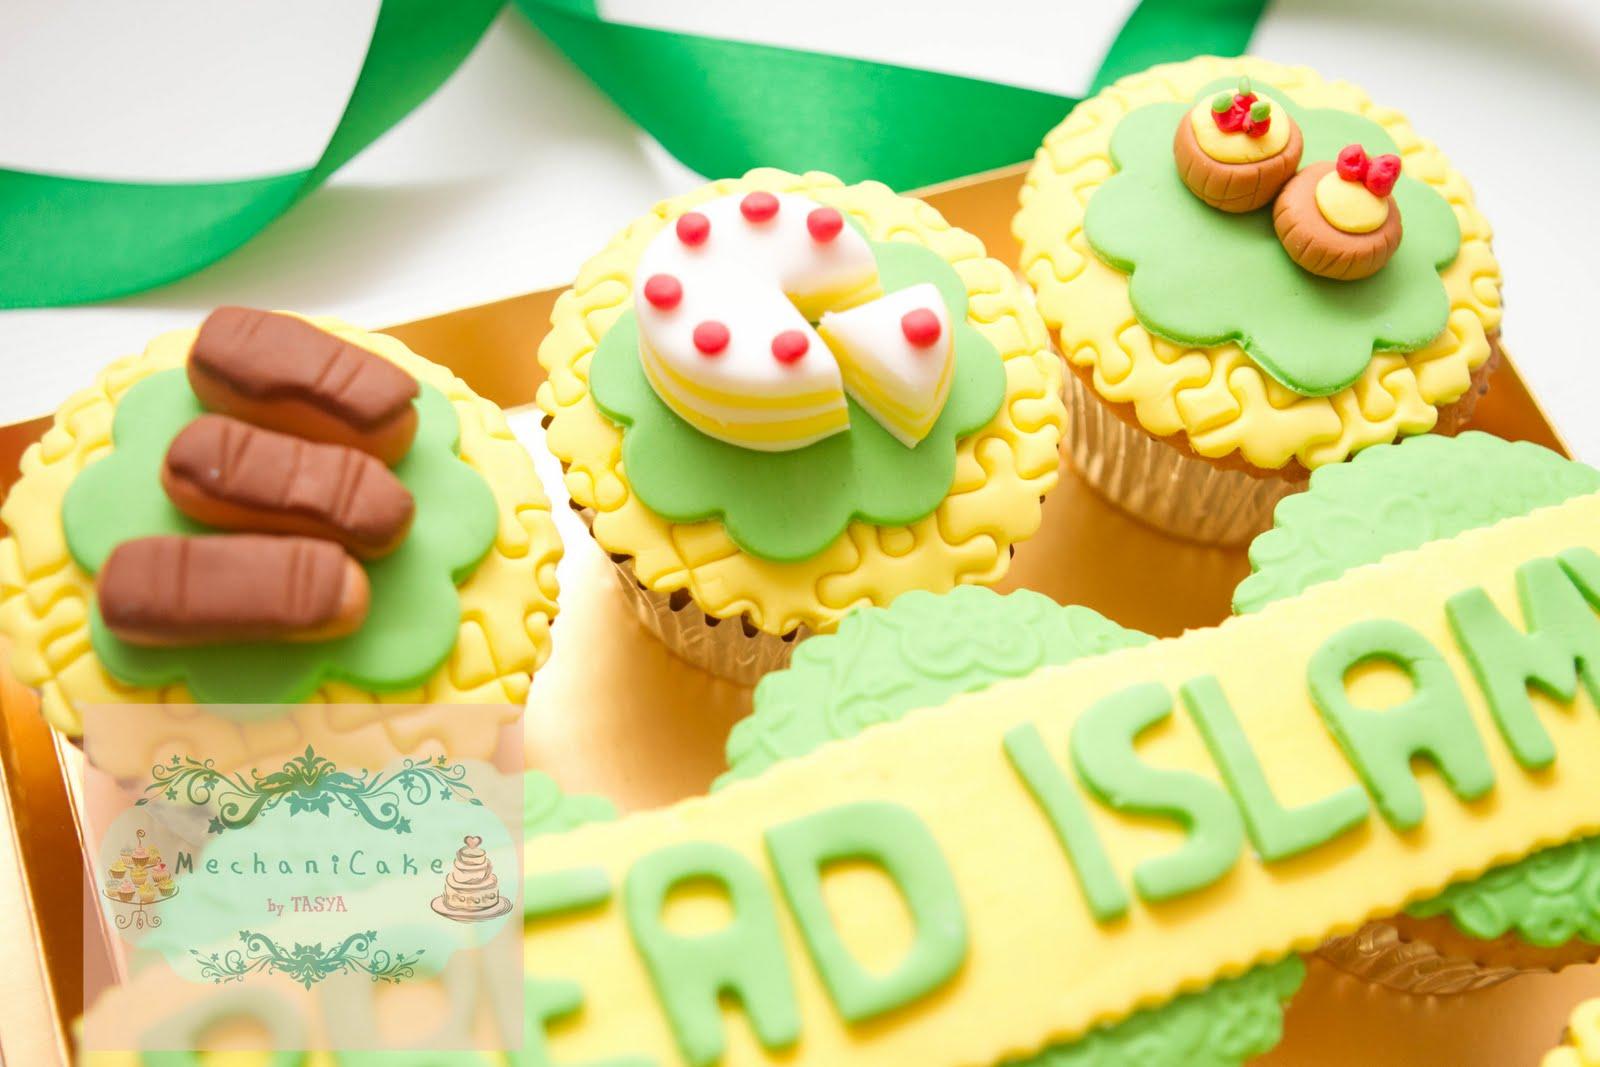 MechaniCake: Cake + cupcake set for Bread Islamy Opening